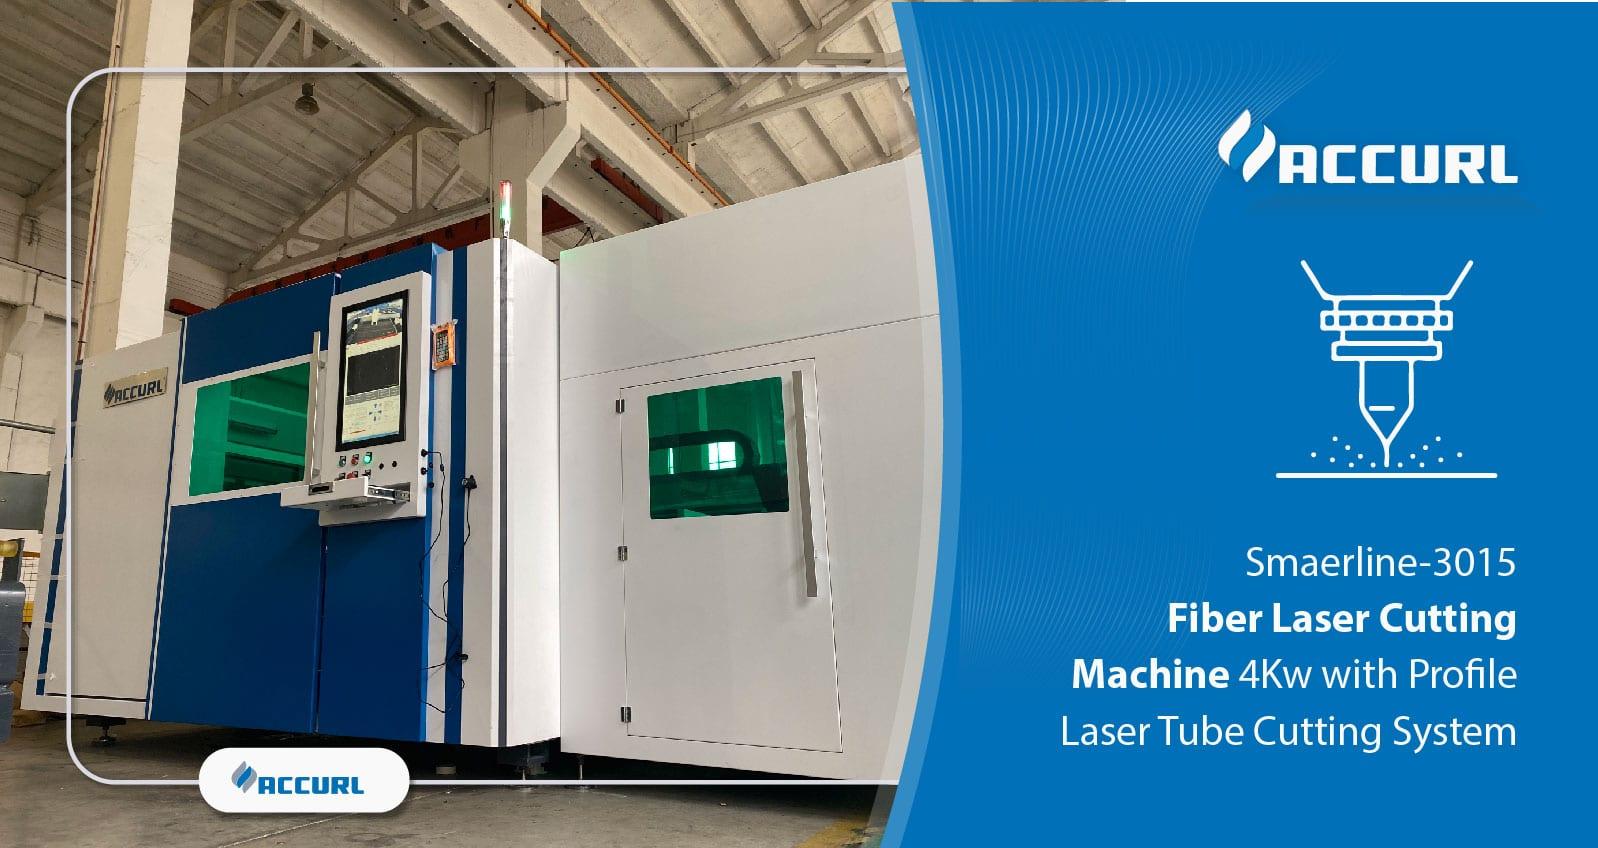 Smaerline-3015 Fiber Laser Cutting Machine 4Kw with Profile Laser Tube Cutting System